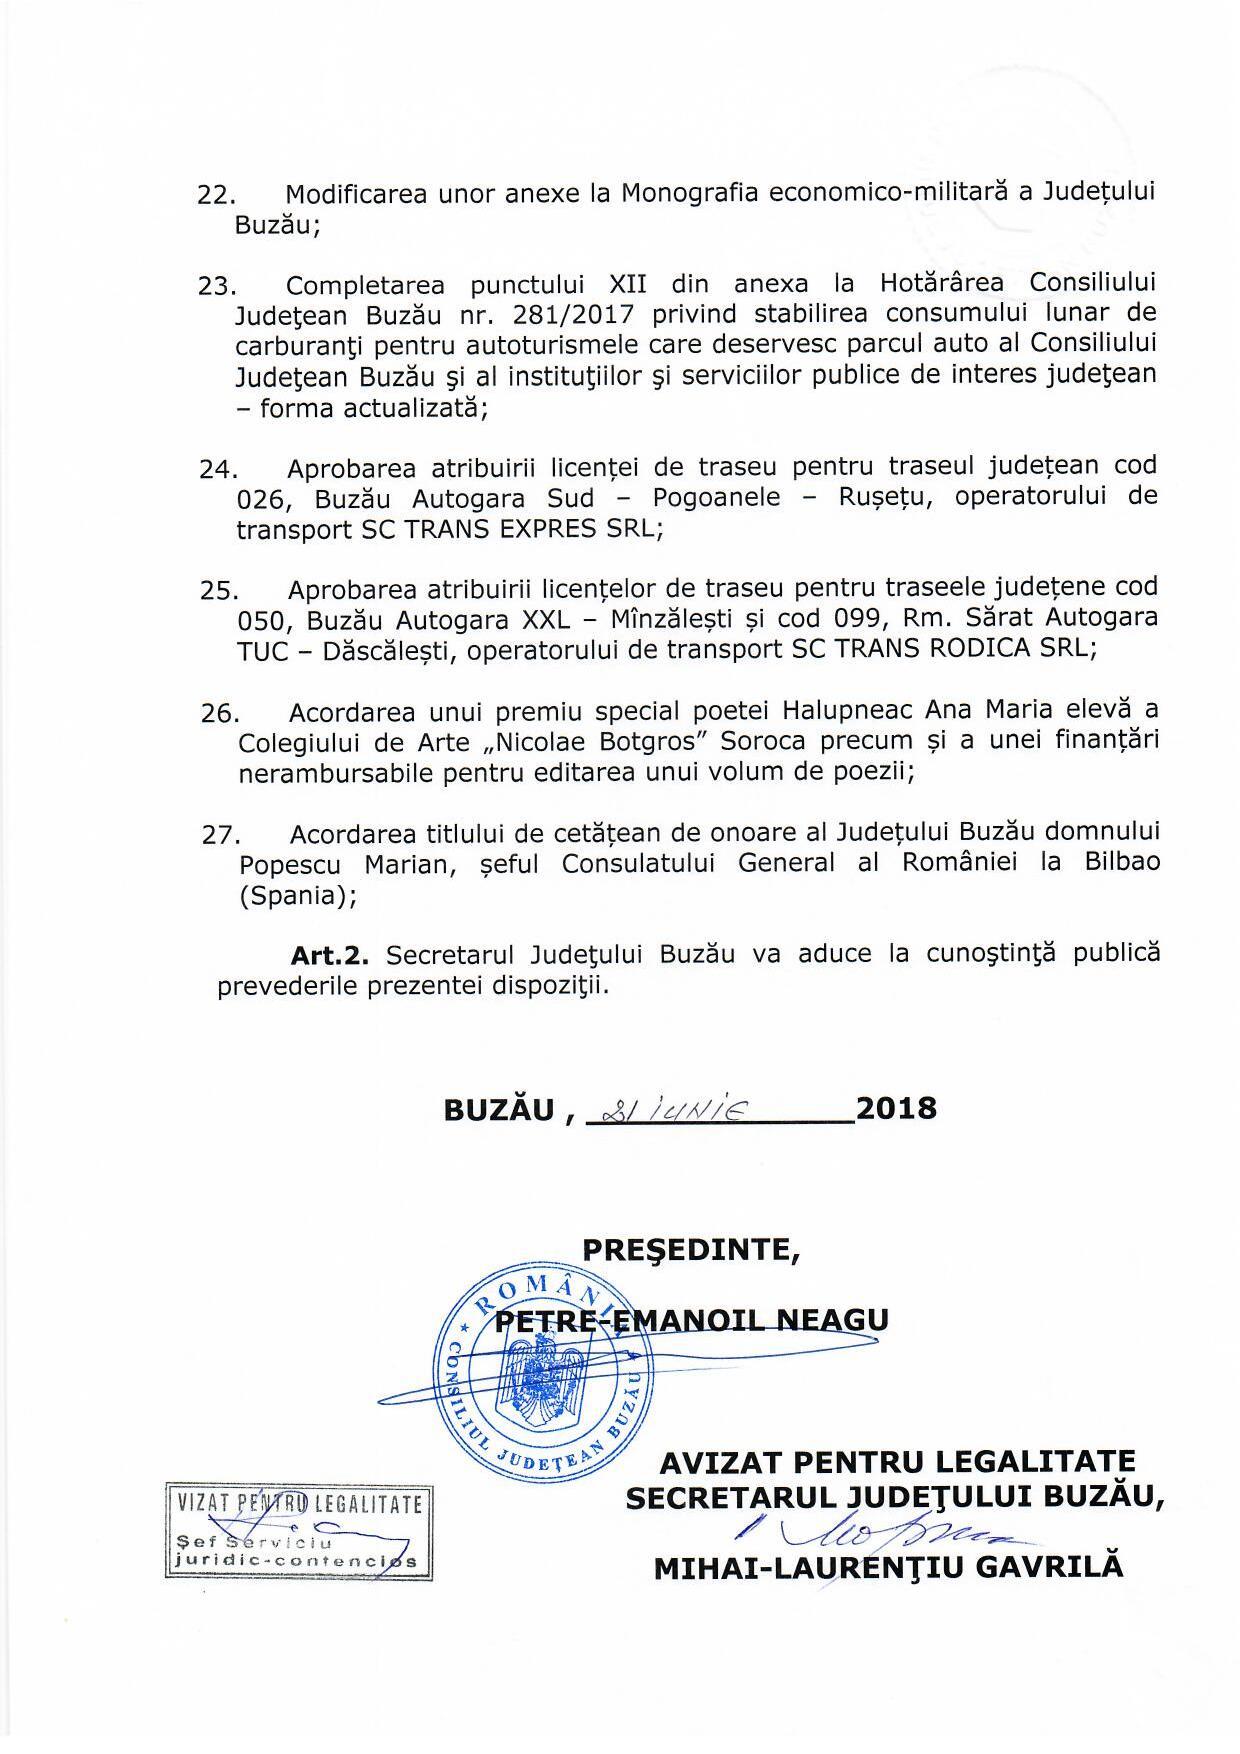 sedinta iunie 2018 consiliul judetean buzau-page-003